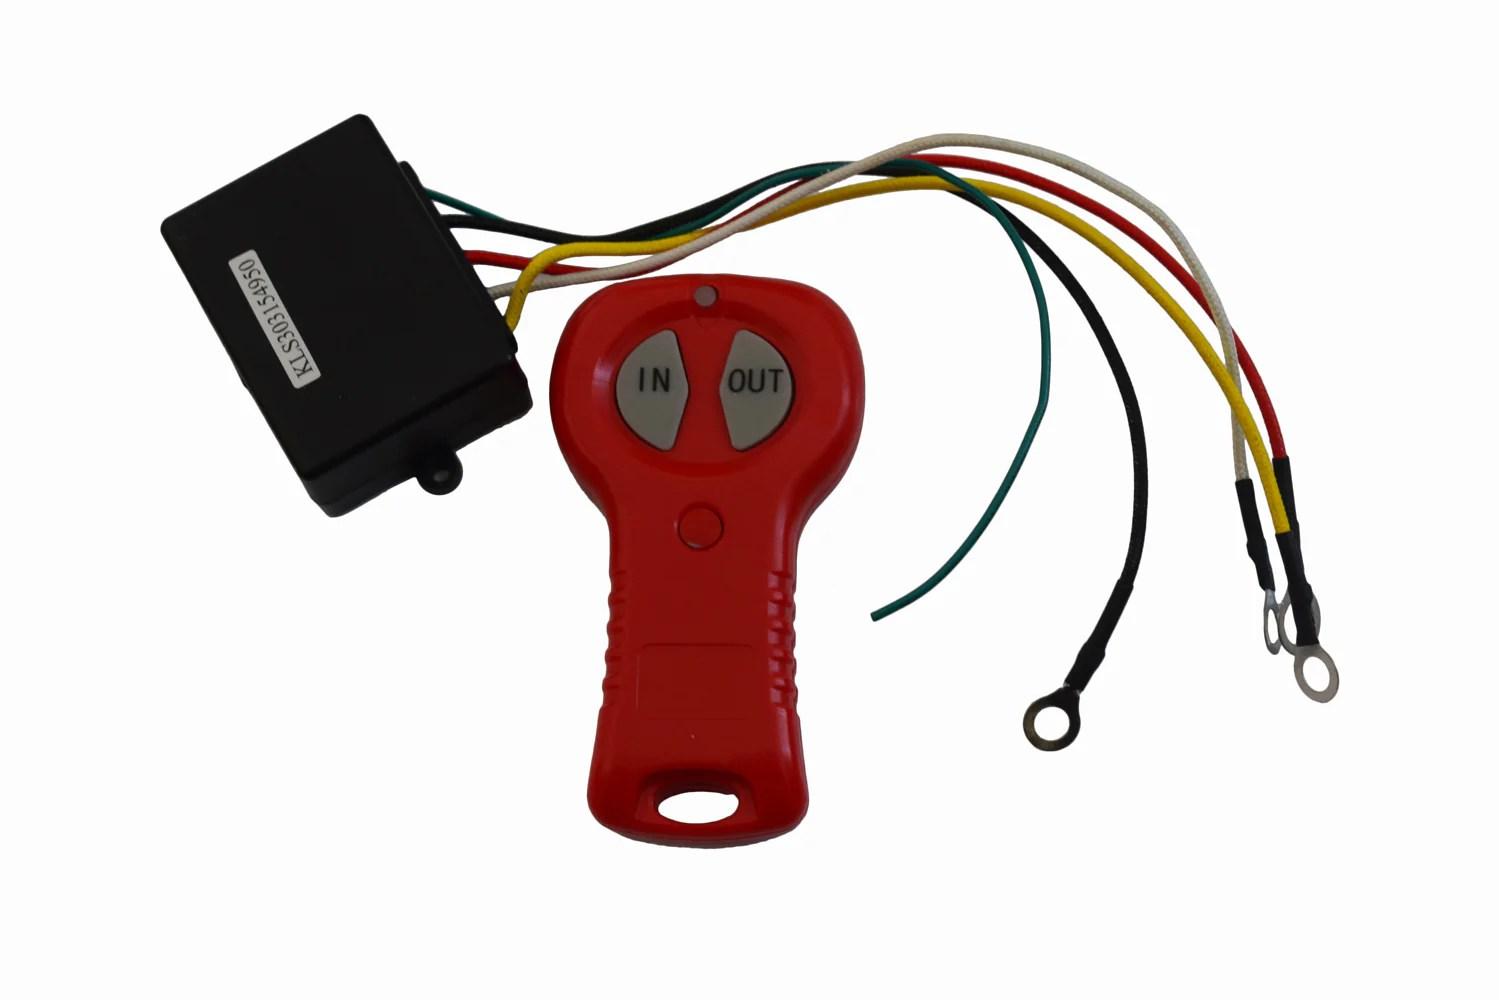 hight resolution of atv utv electric winch remote control